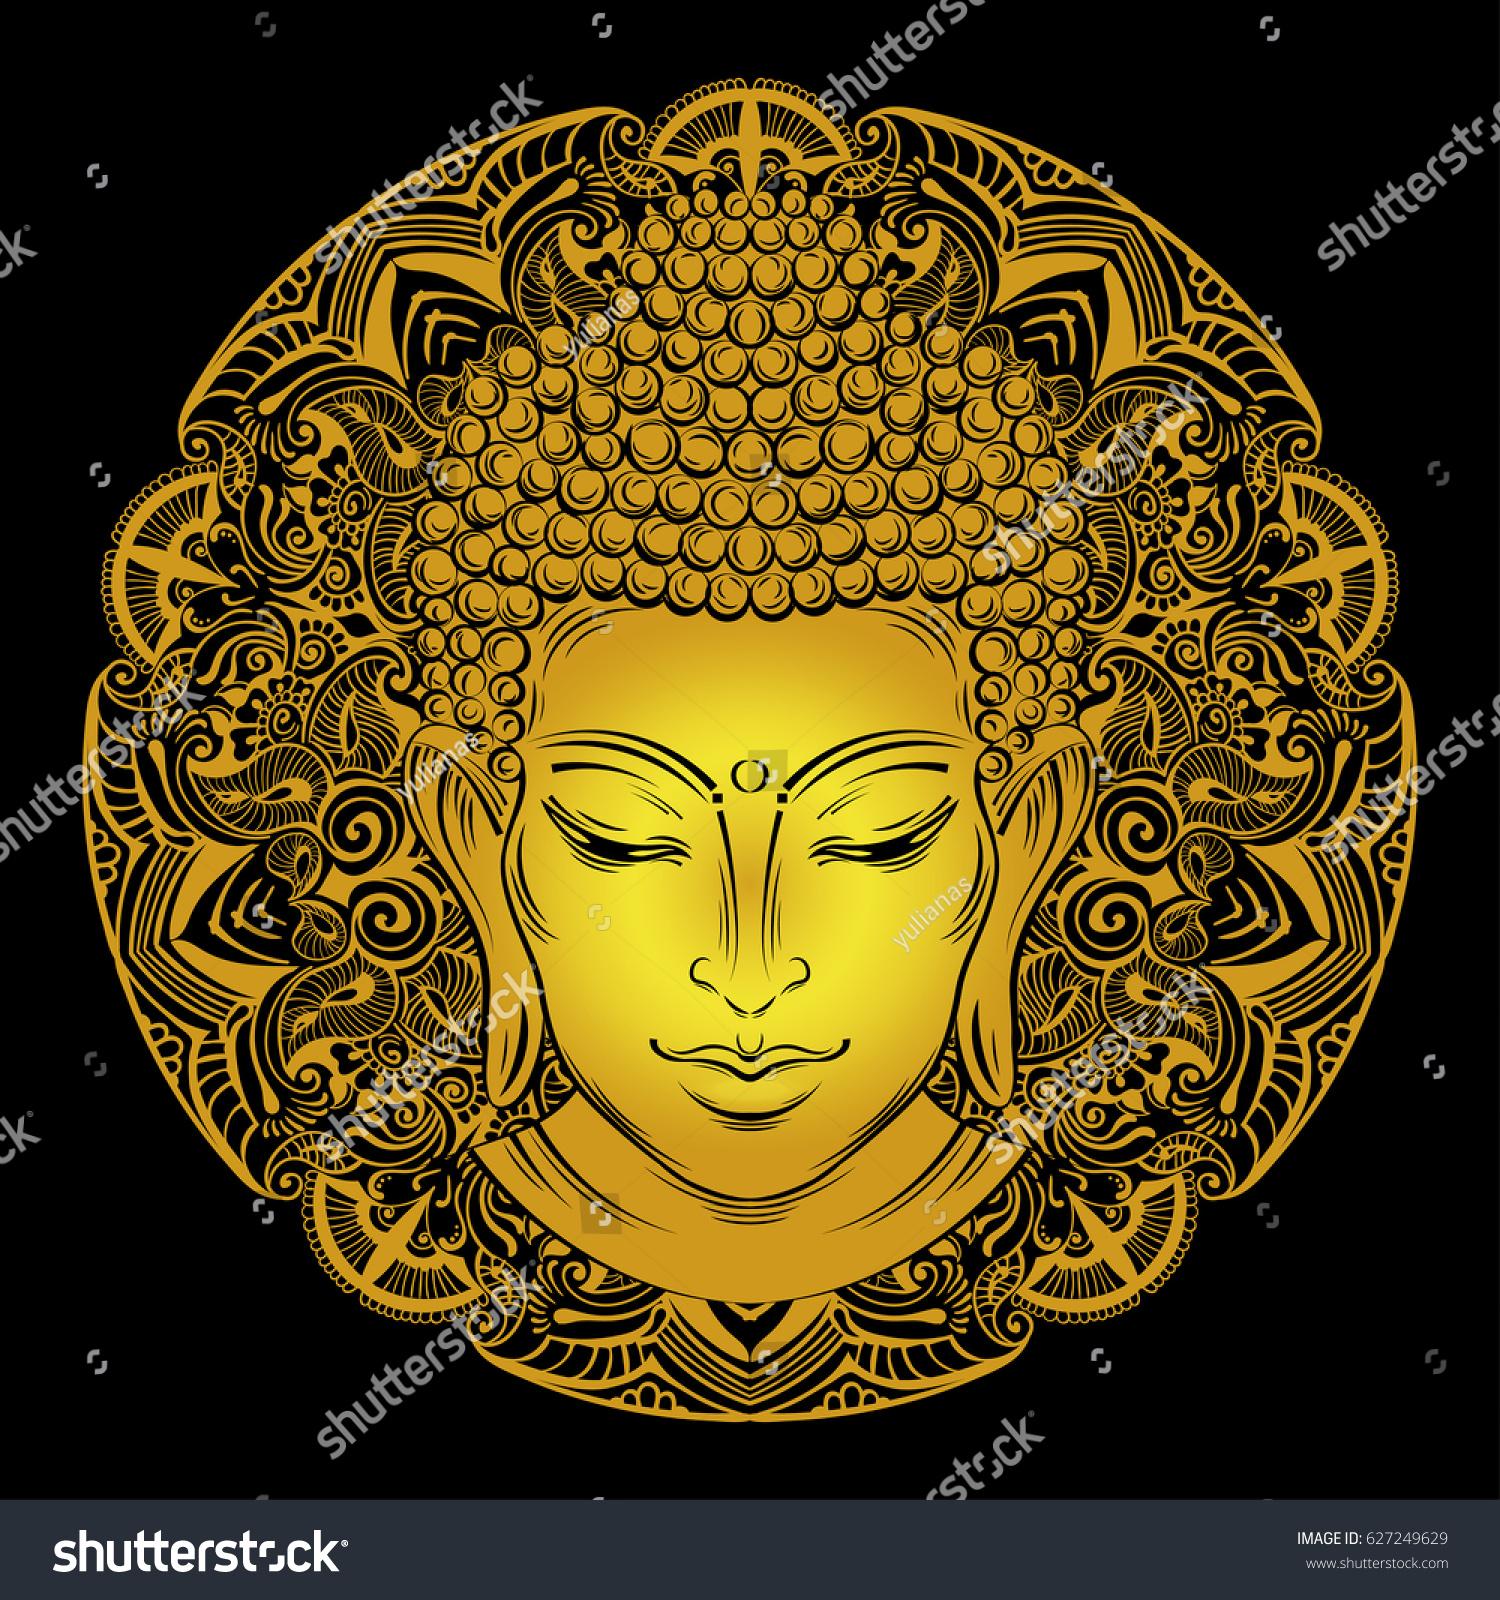 Stock Images, Royalty-Free Images  for Gautam Buddha Face Tattoo  587fsj